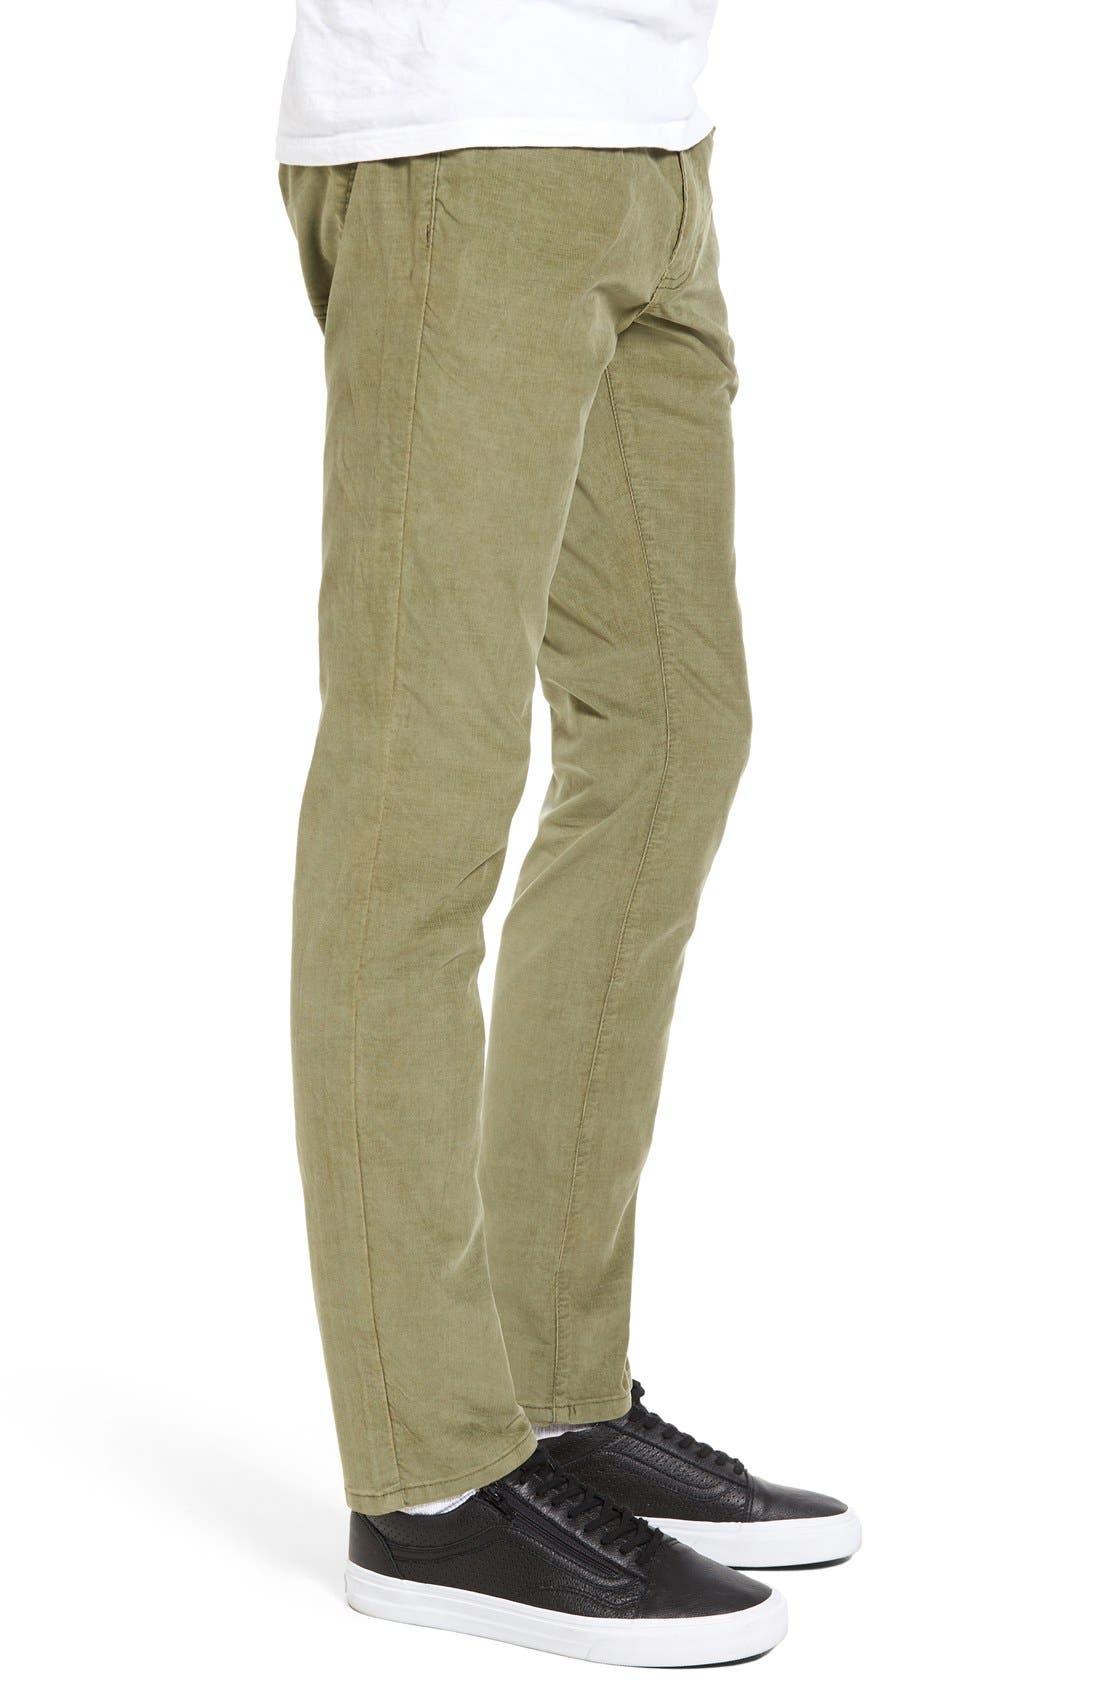 Bryce Chopper Slim Fit Corduroy Pants,                             Alternate thumbnail 3, color,                             Olive